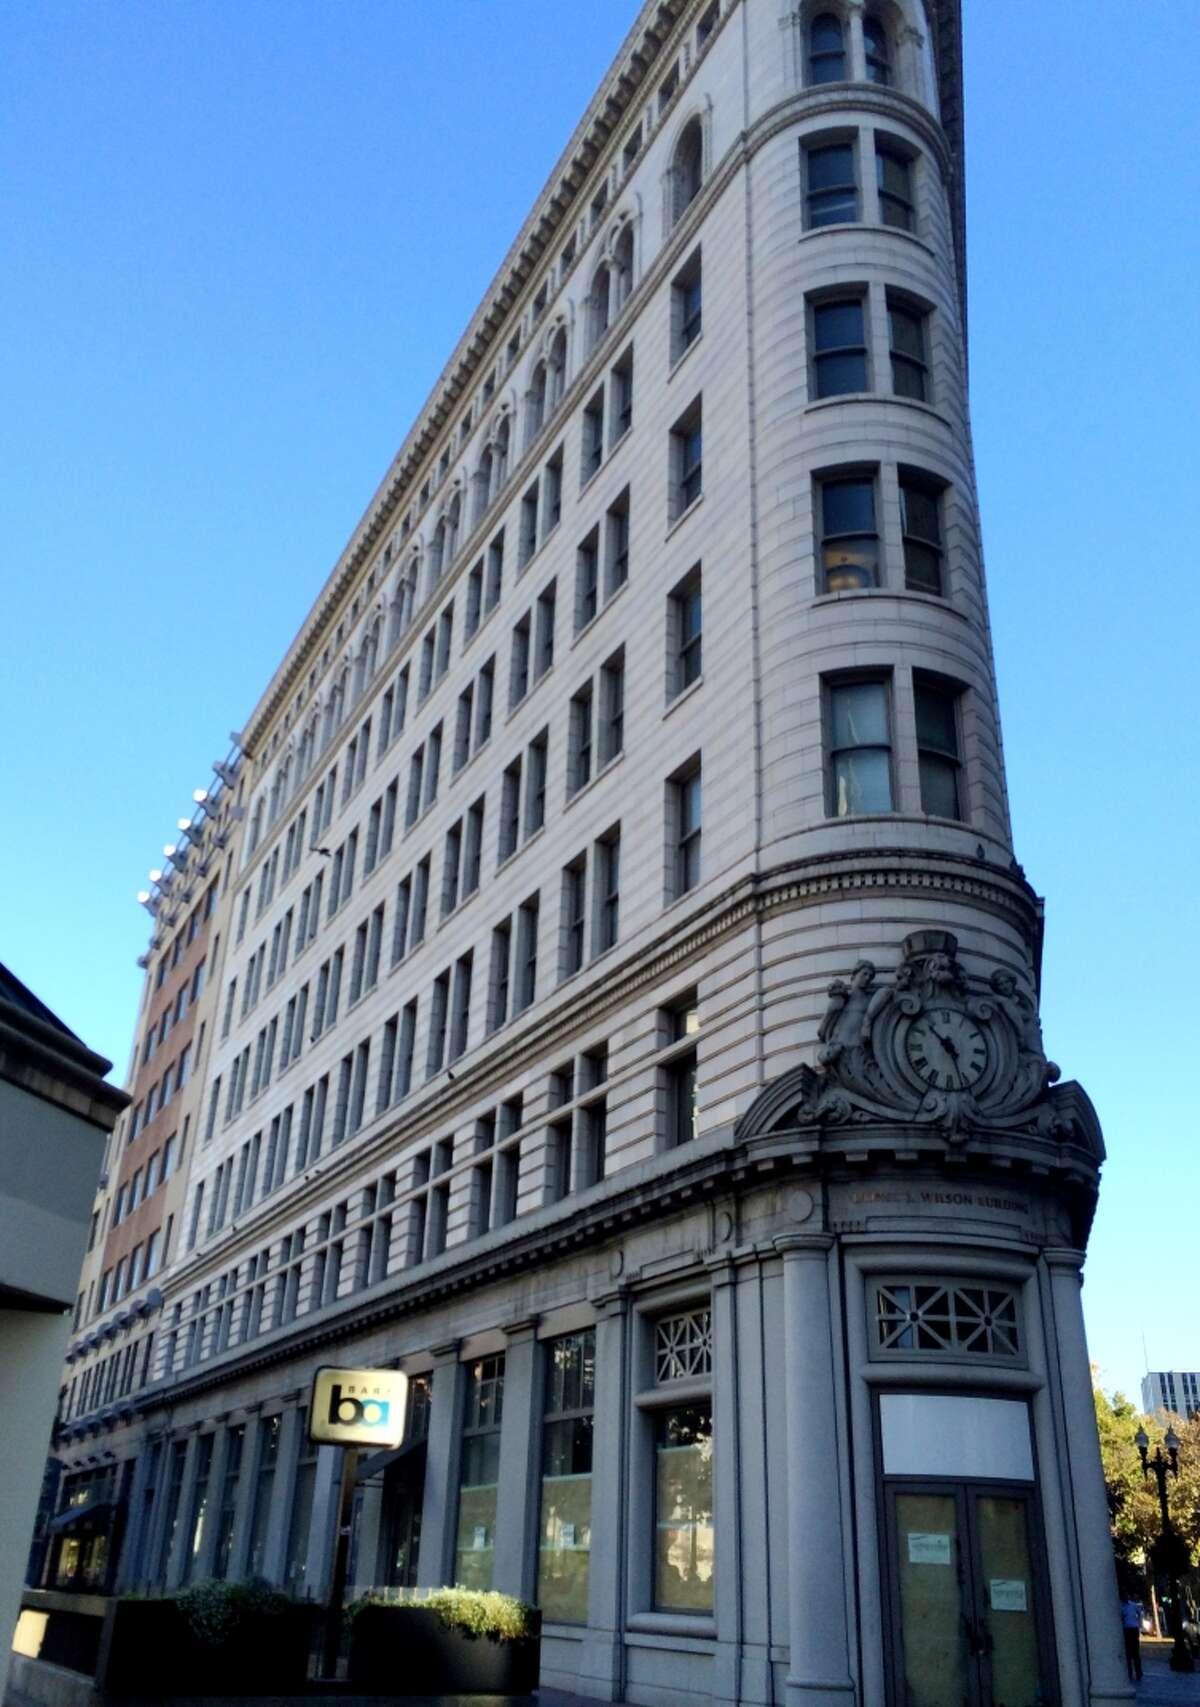 Laurel Book Store in downtown Oakland is located in the landmark 1907 Lionel J. Wilson Building.